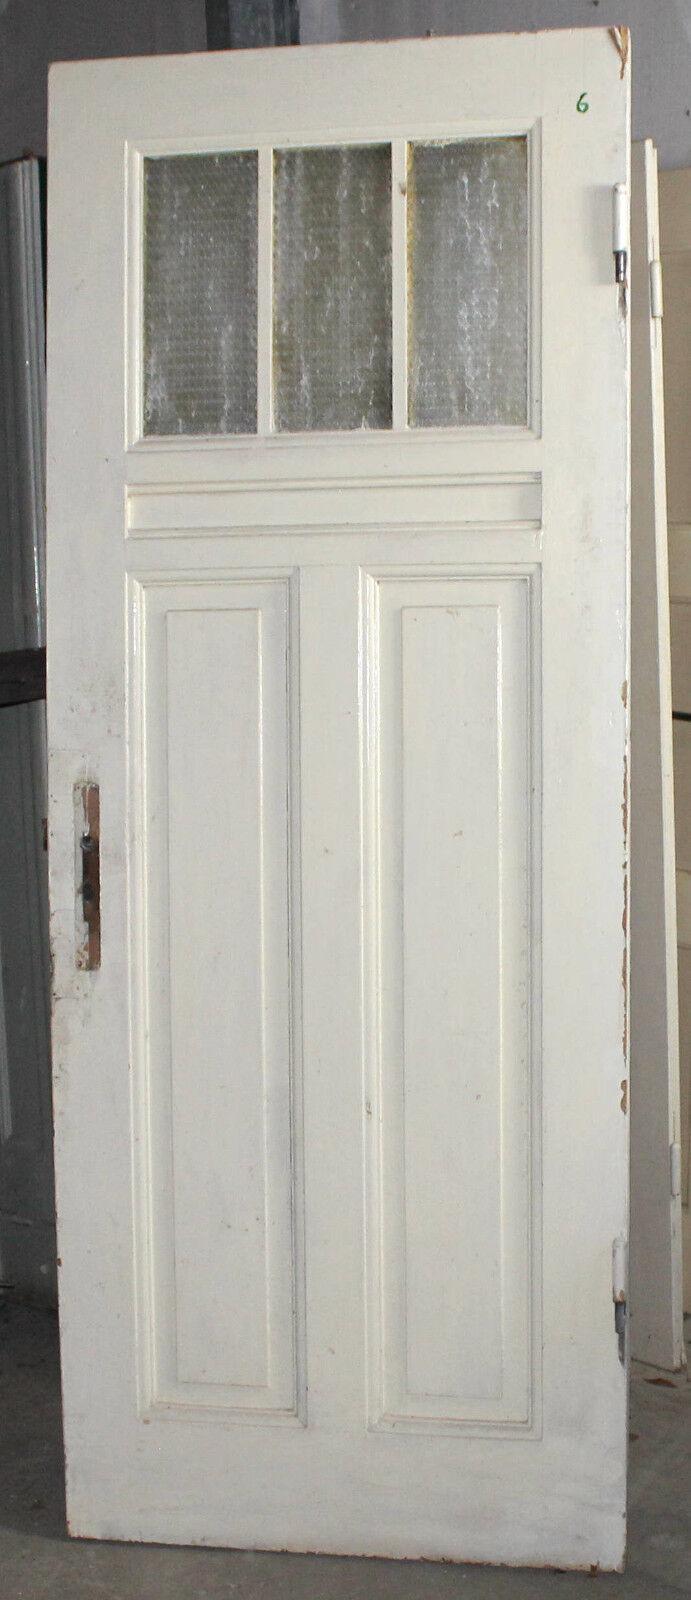 Haustür antik 2 Flügel Rahmenteile Oberlicht Tür